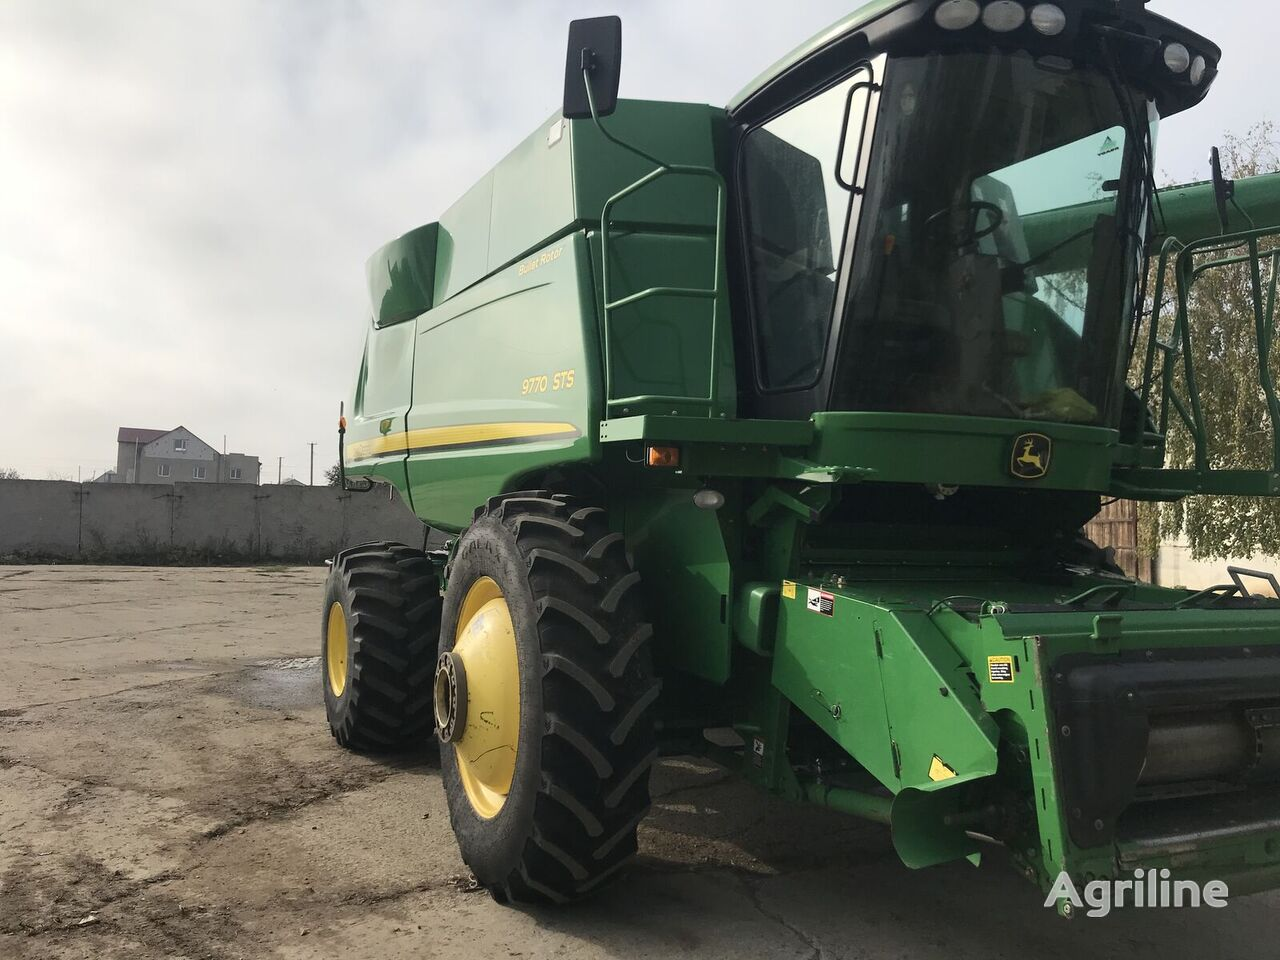 JOHN DEERE 9770 STS AKCIYa!!!!!!!!!NDS TRADE-IN combine-harvester